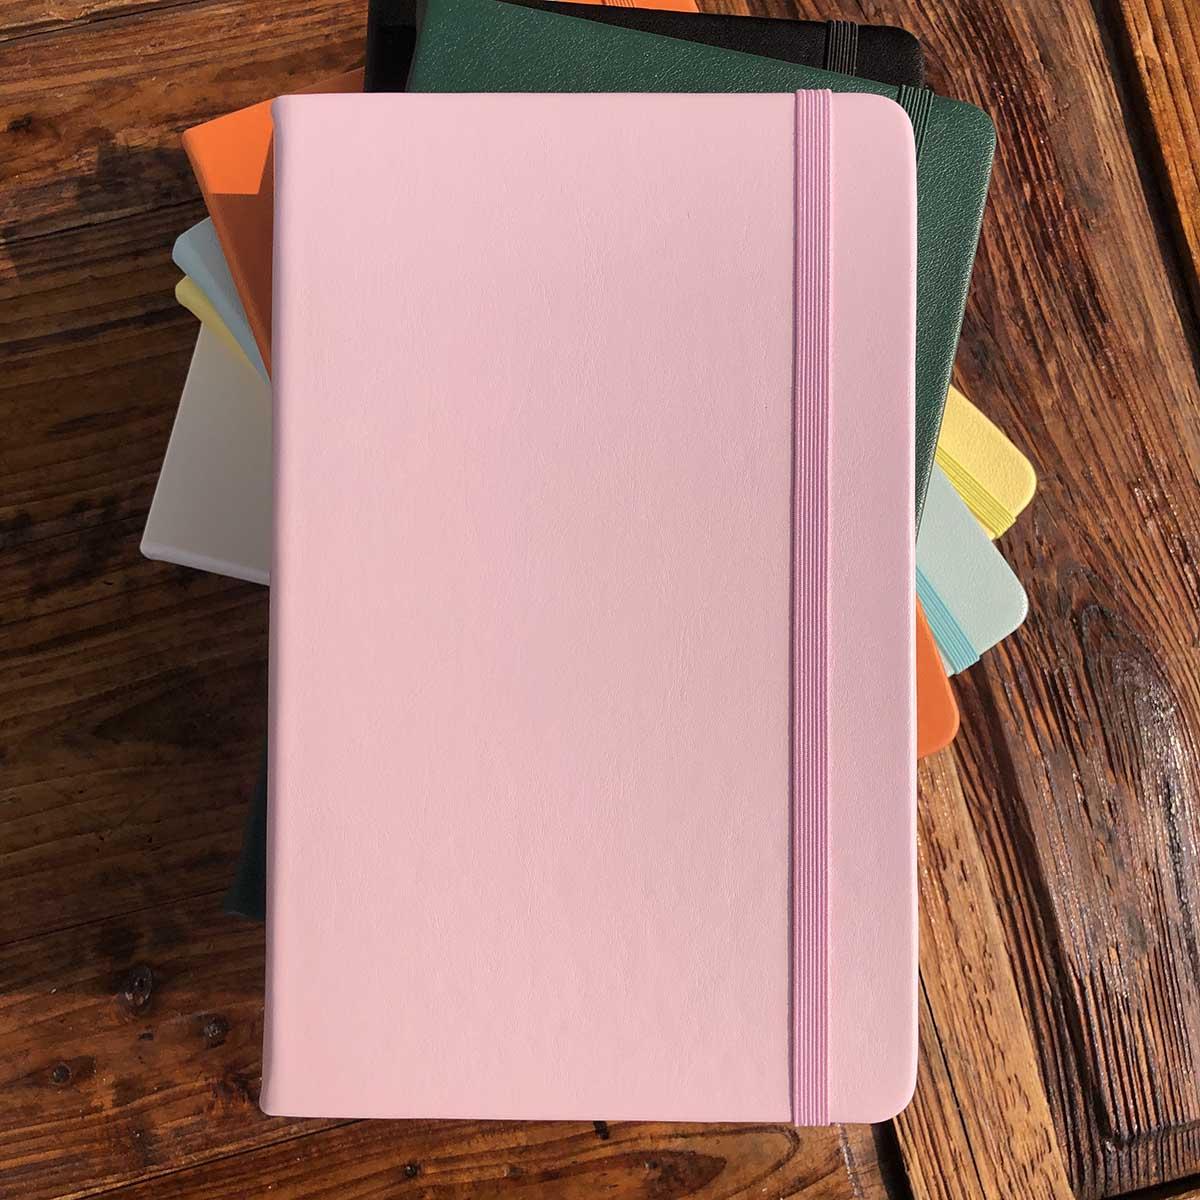 PU Leather Notebook Art Sketchbook Dot Grid Journals 100gsm Paper 192pages